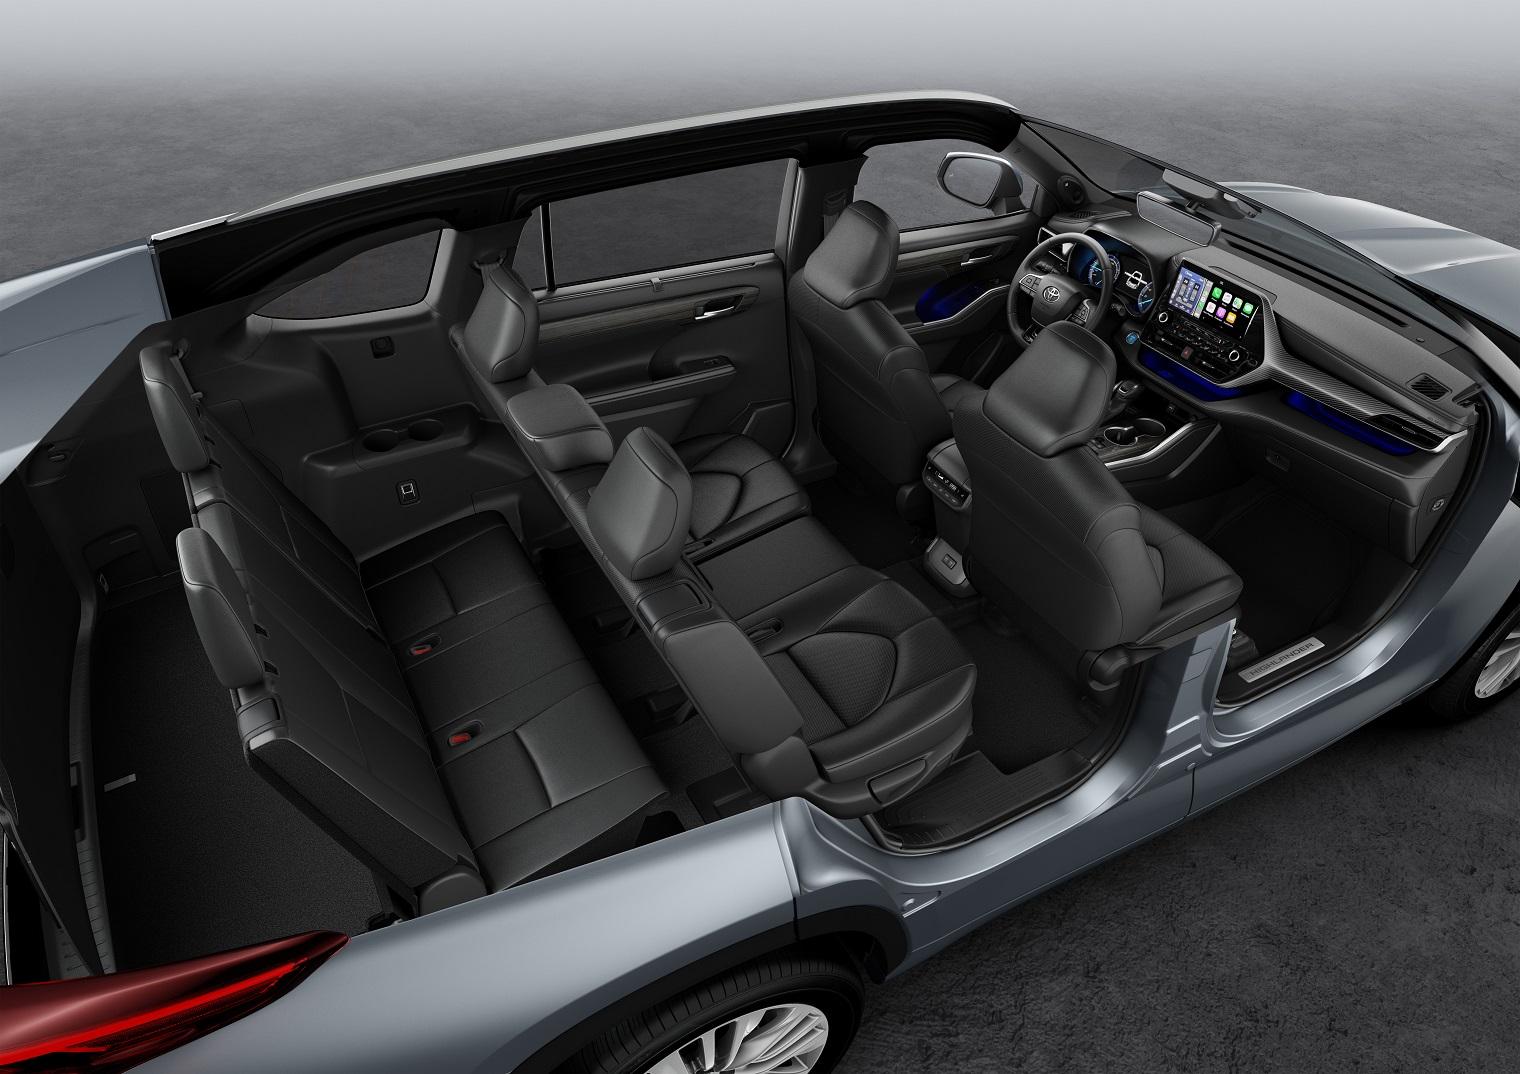 allestimenti nuovo Toyota Highlander 2021